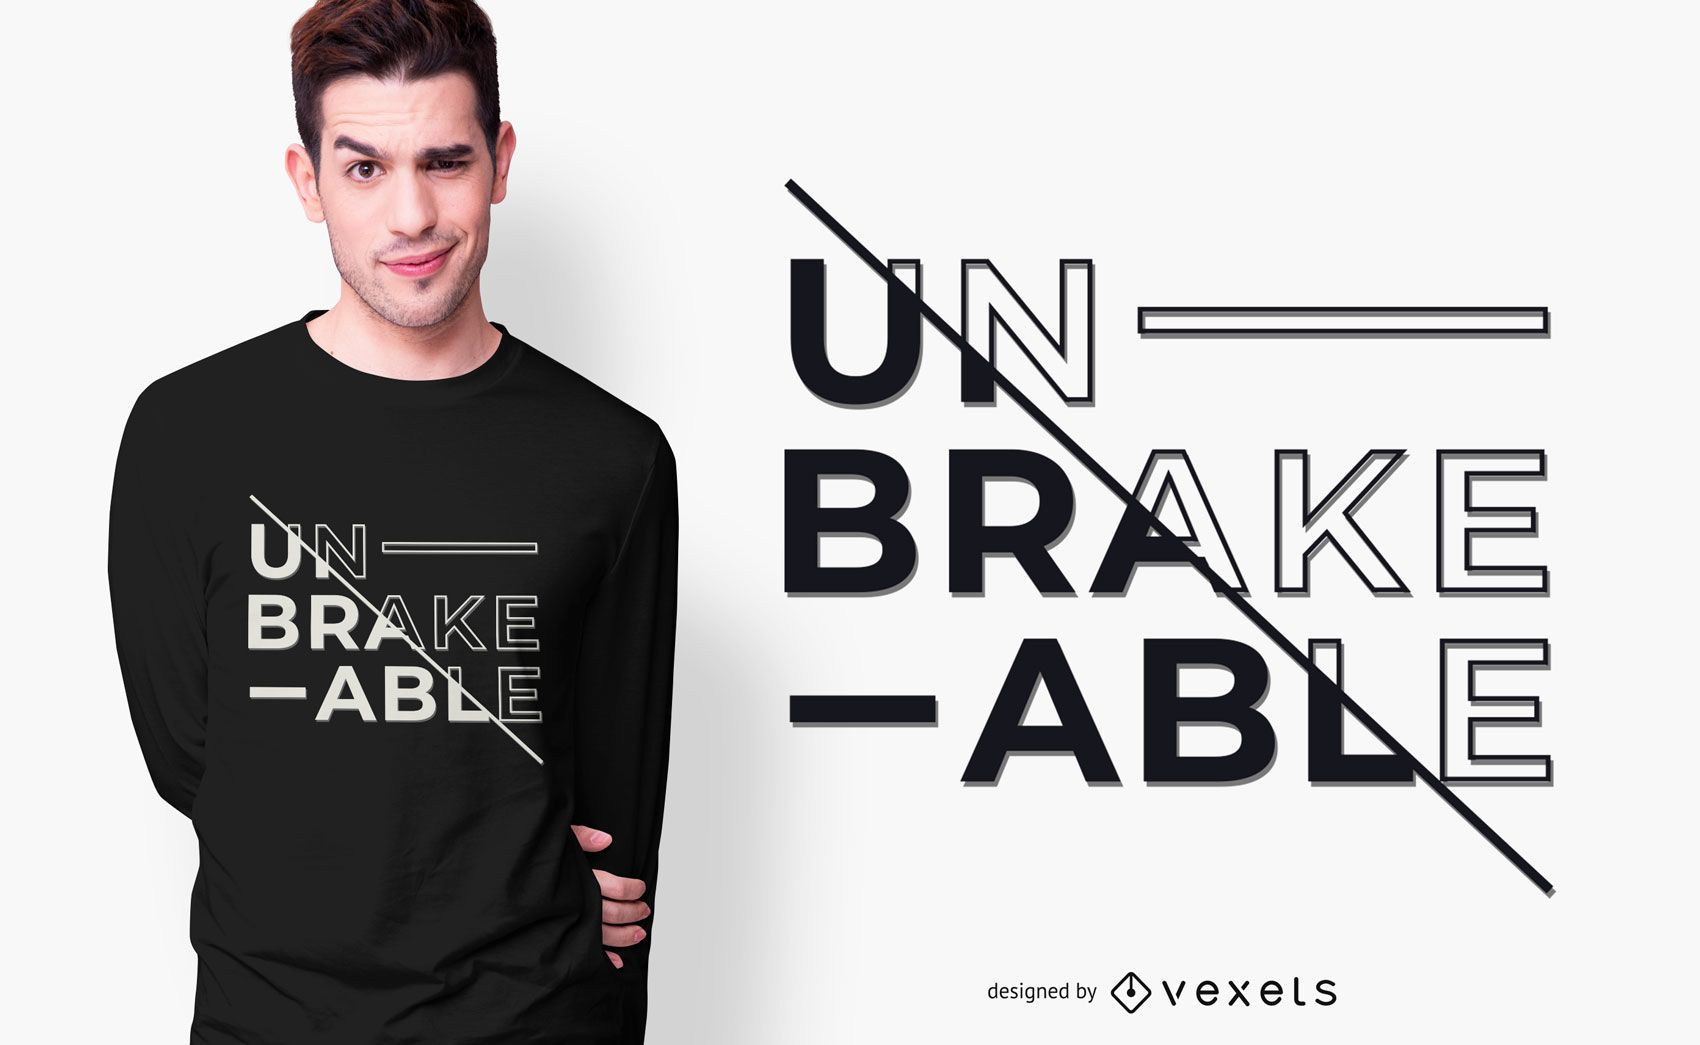 unbreakable t-shirt design